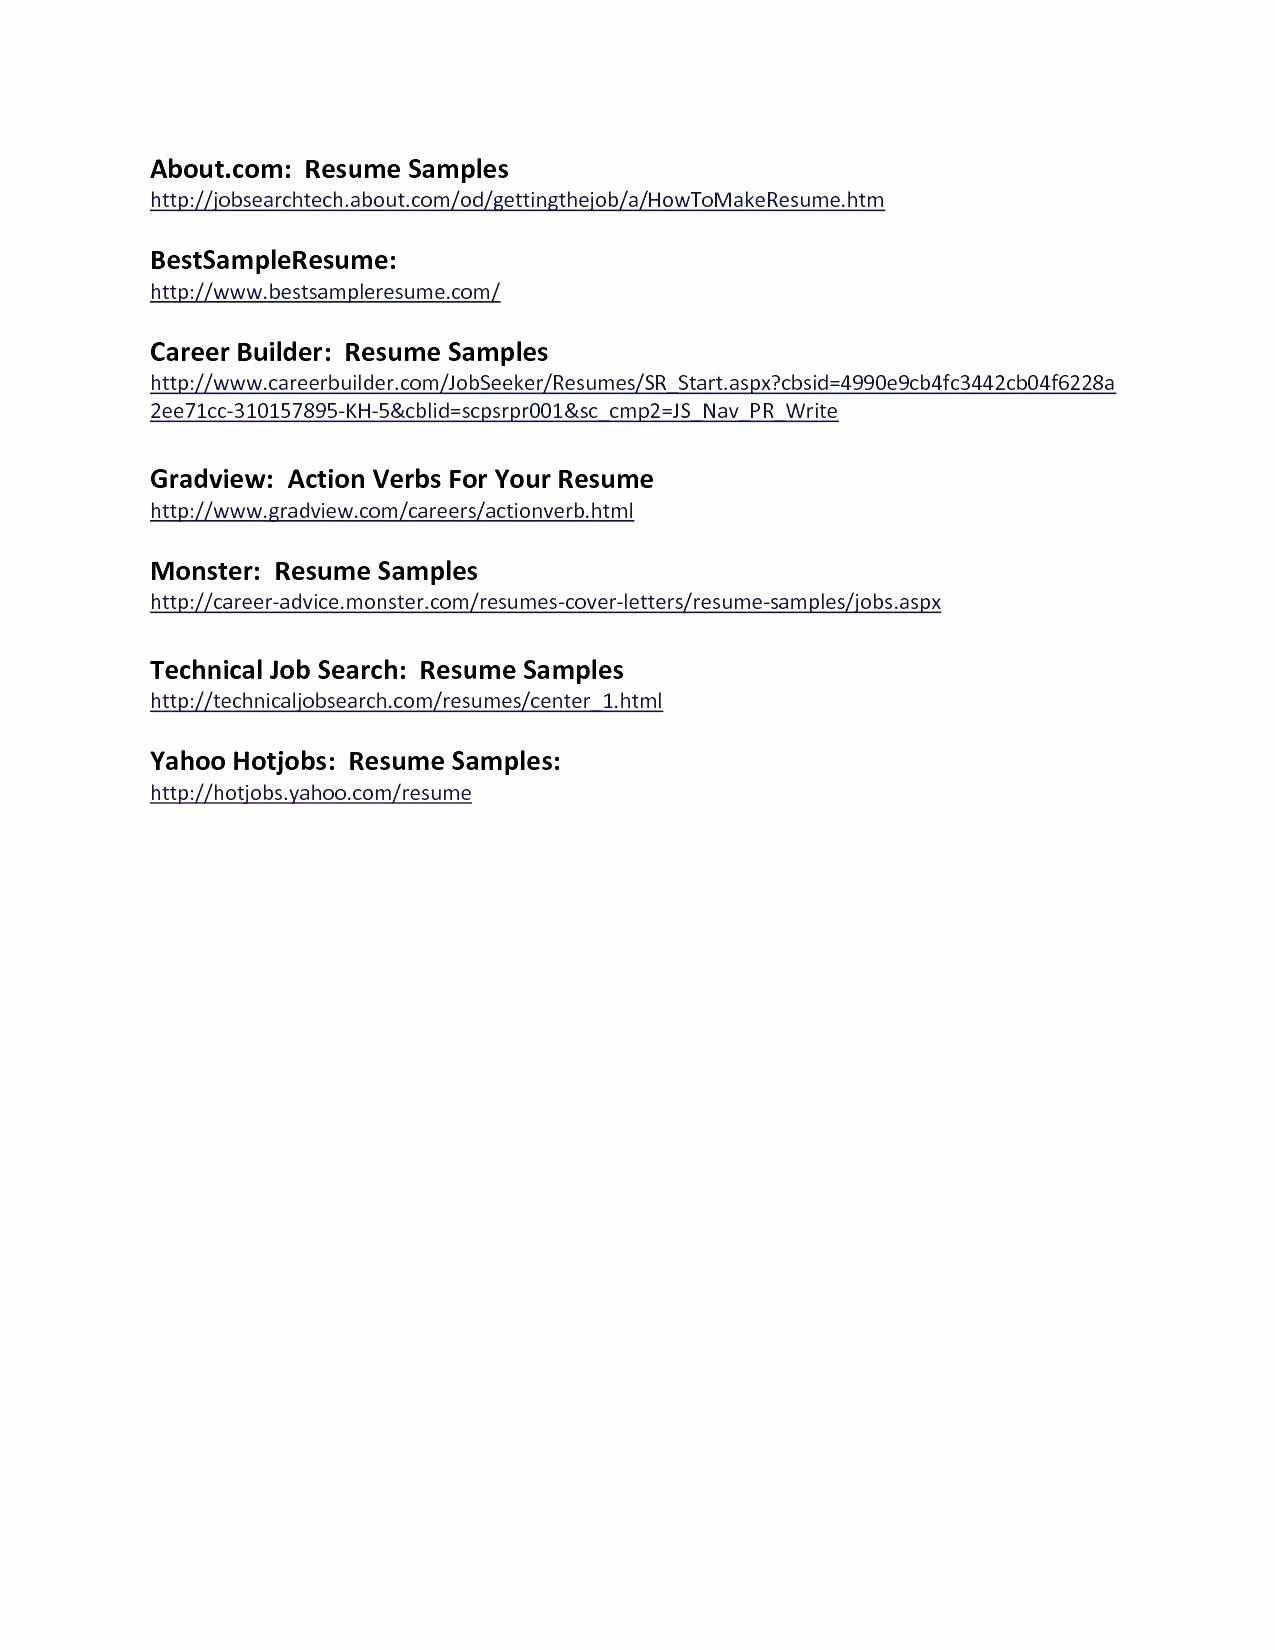 70 Cool Stock Of Resume Samples for Nanny Jobs | Resume ...